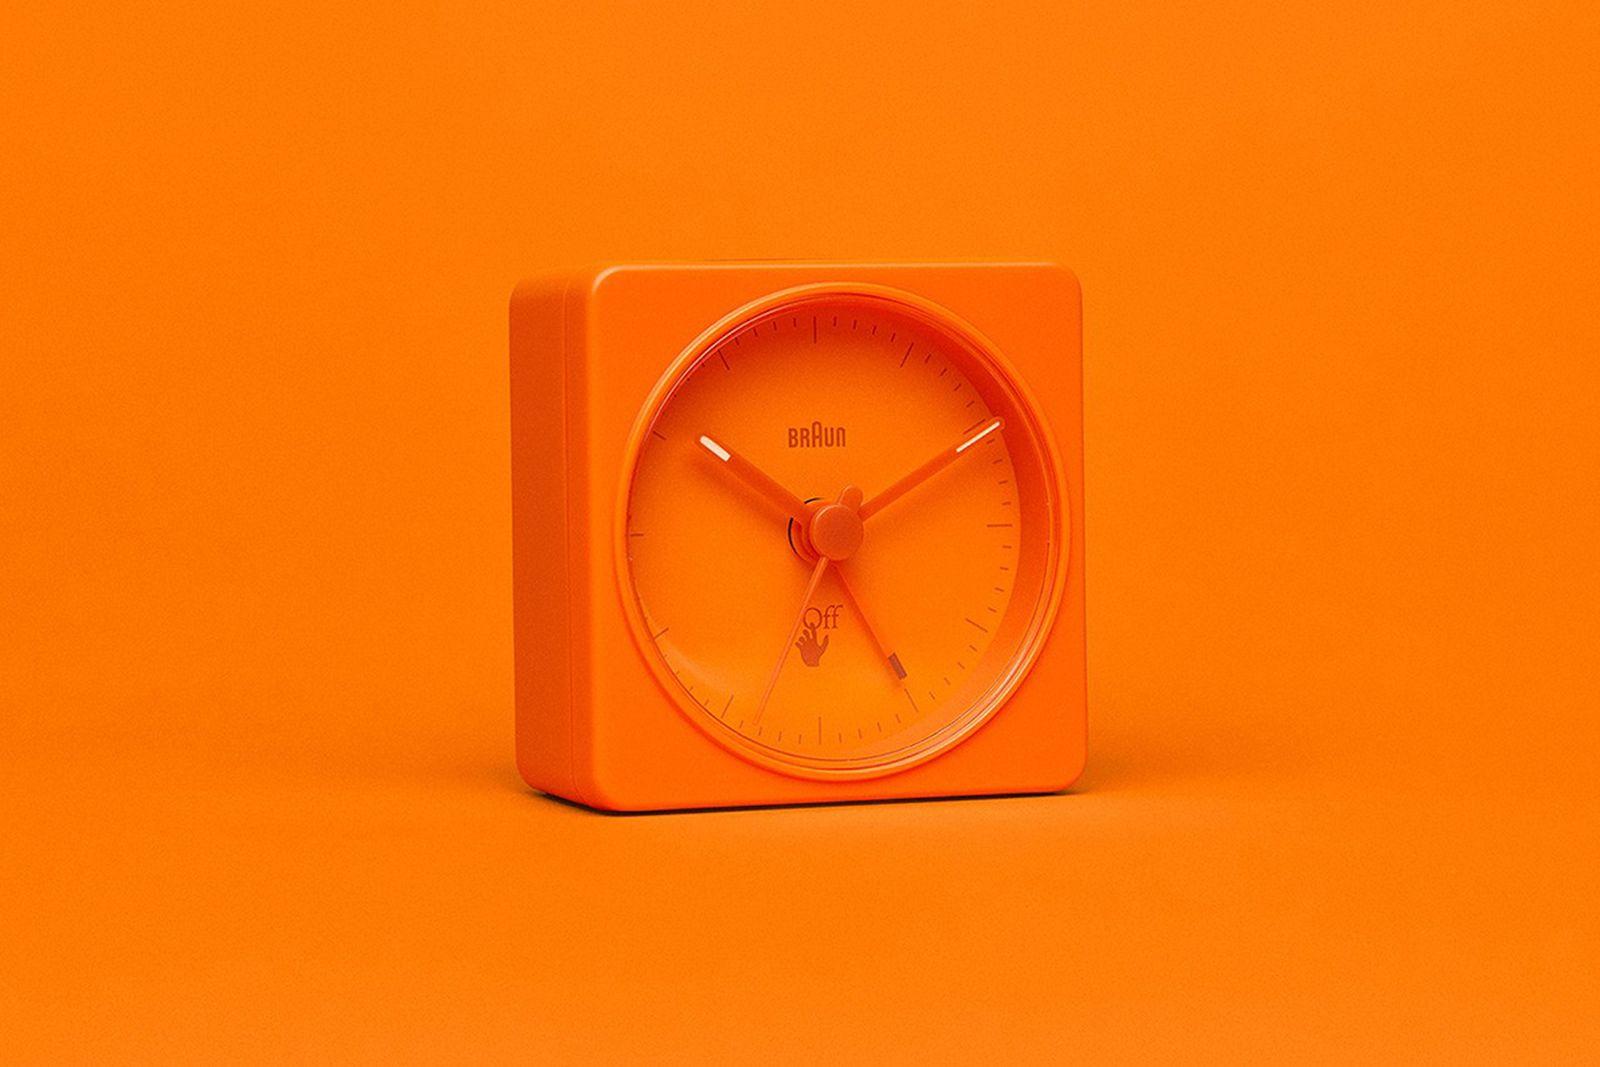 virgil-abloh-off-white-braun-alarm-clock-01